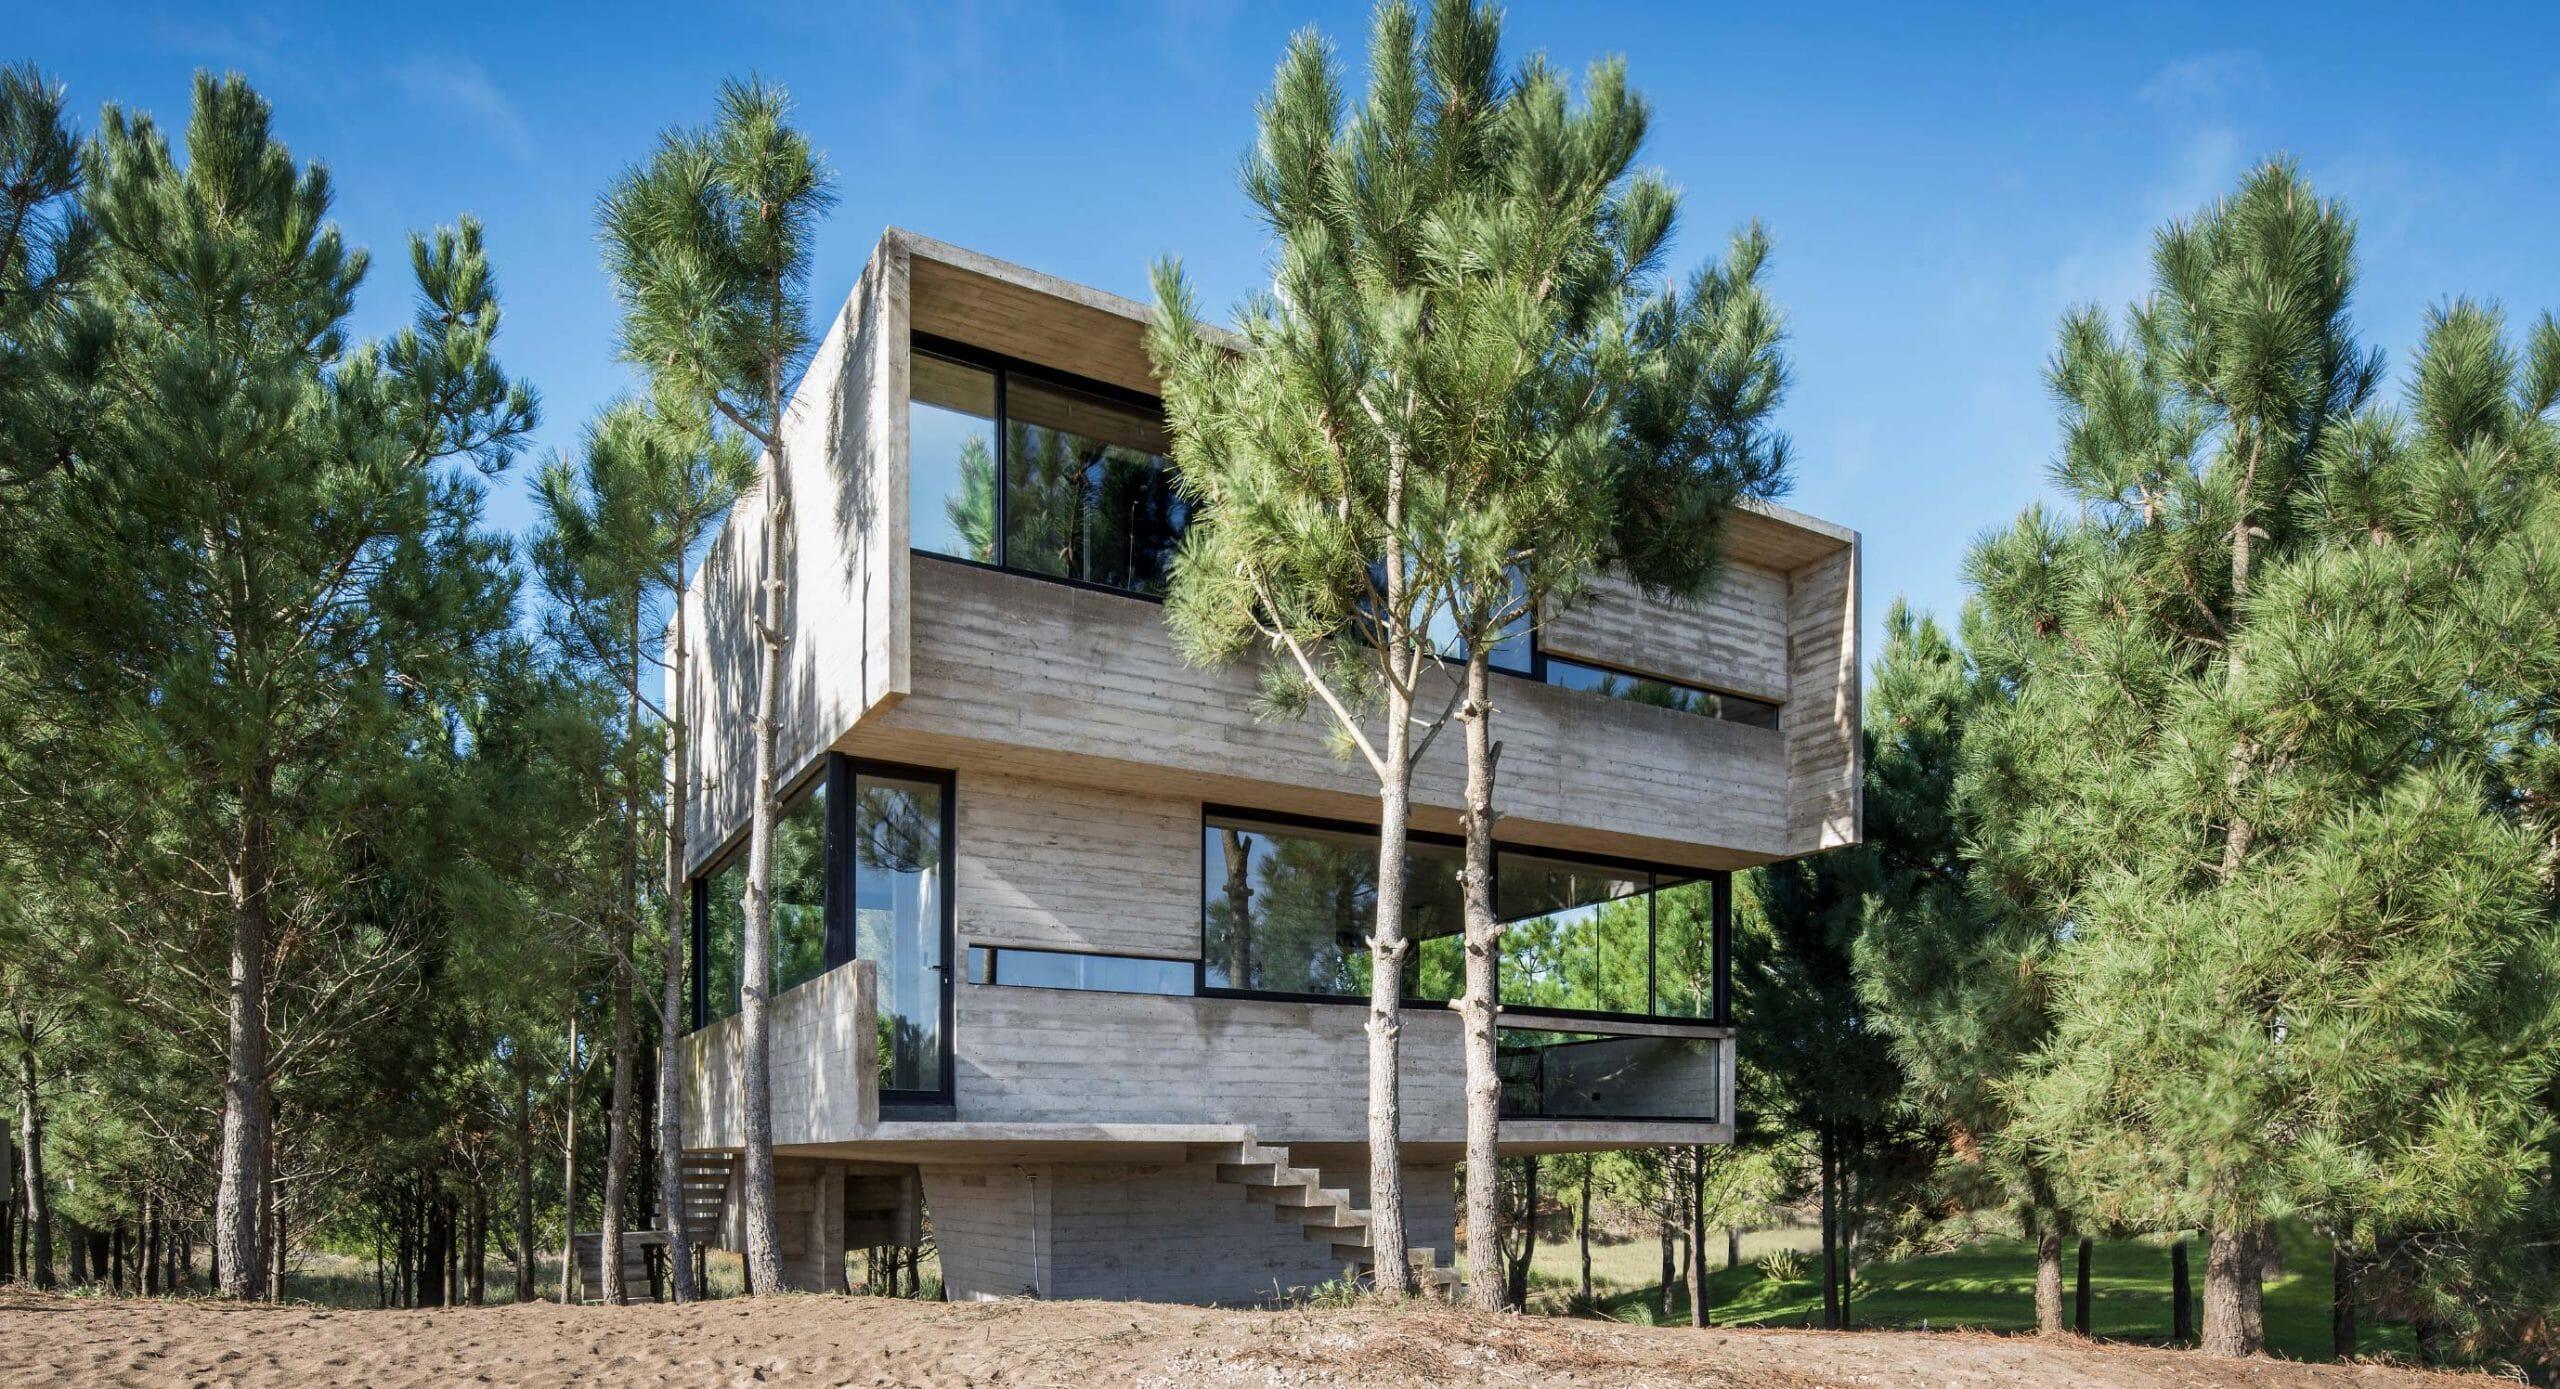 House in the Trees: Minimal footprint on surroundings